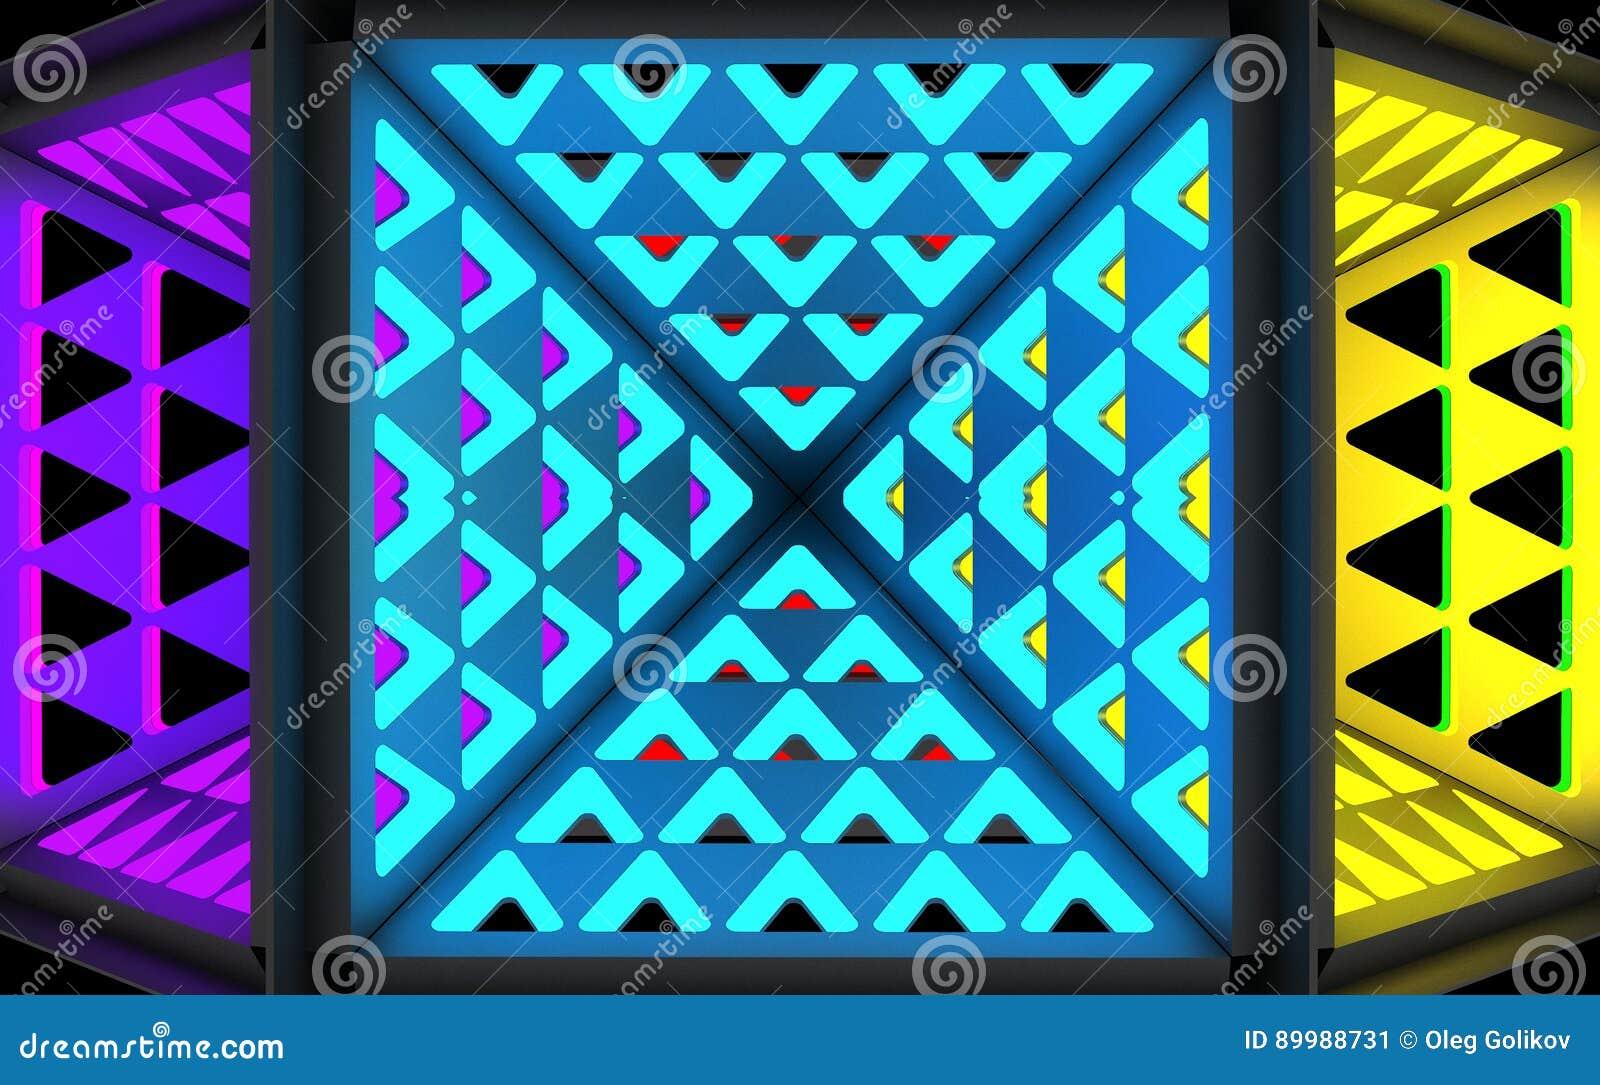 Stilistisk abstrakt ljus bakgrund med en olik geometrisk struktur illustration 3d